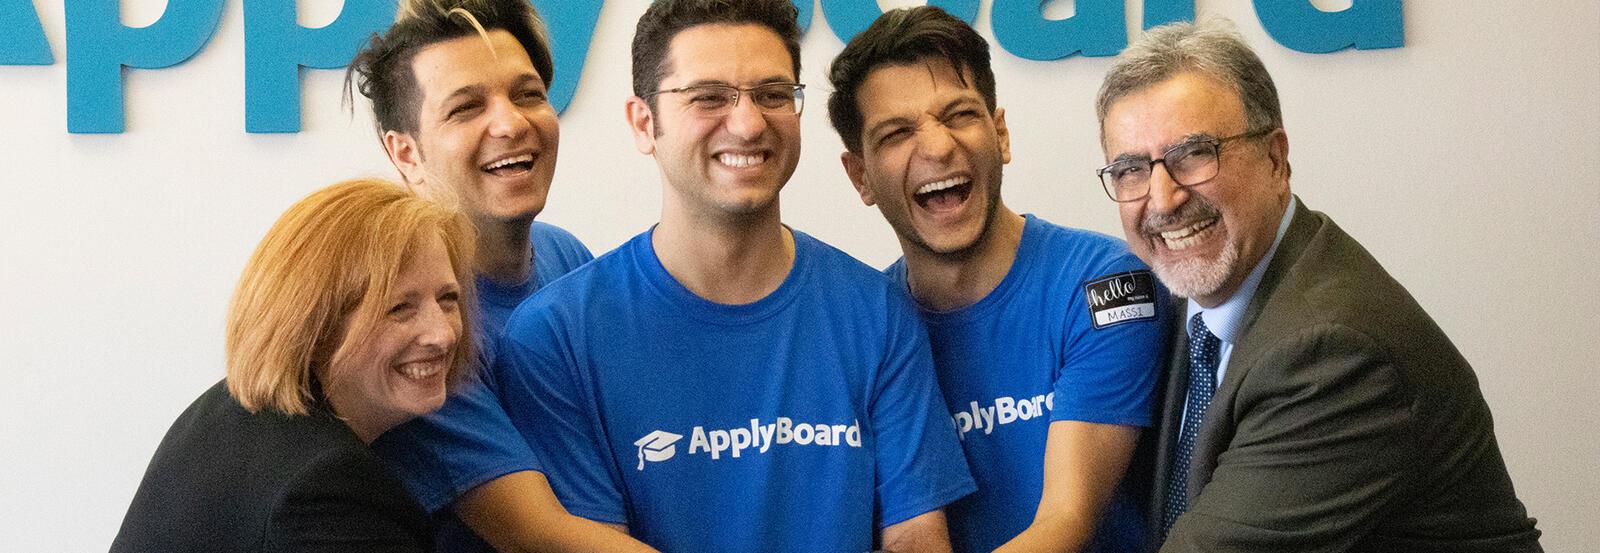 ApplyBoard relocation celebration